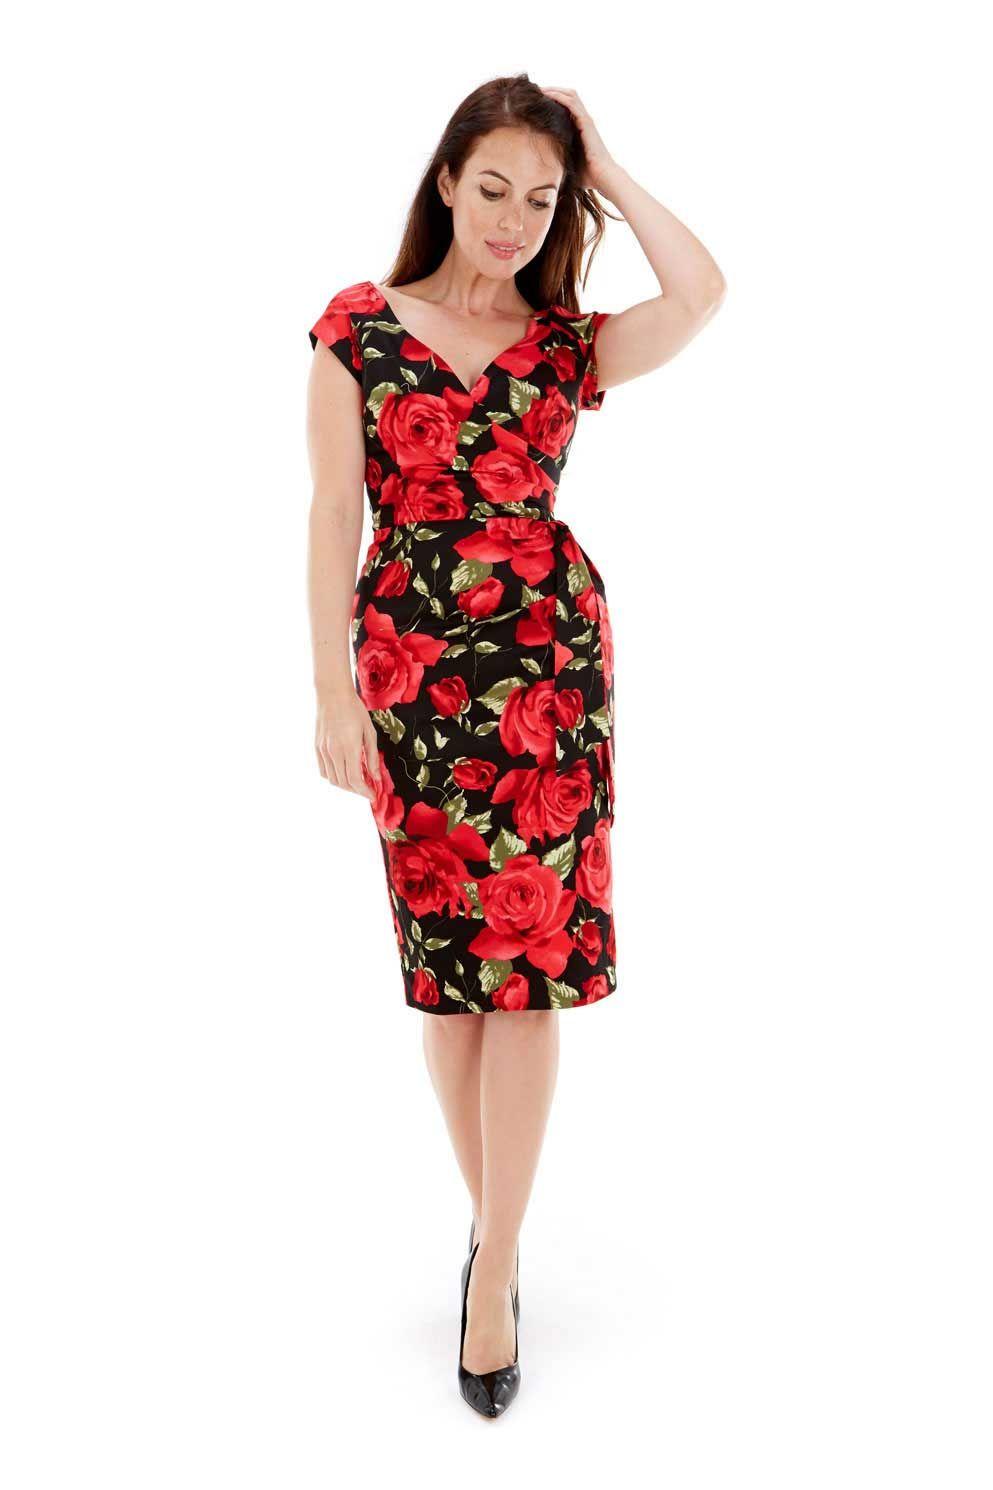 Sorrento Red Rose Hourglass Black Pencil Dress | Frocks ...